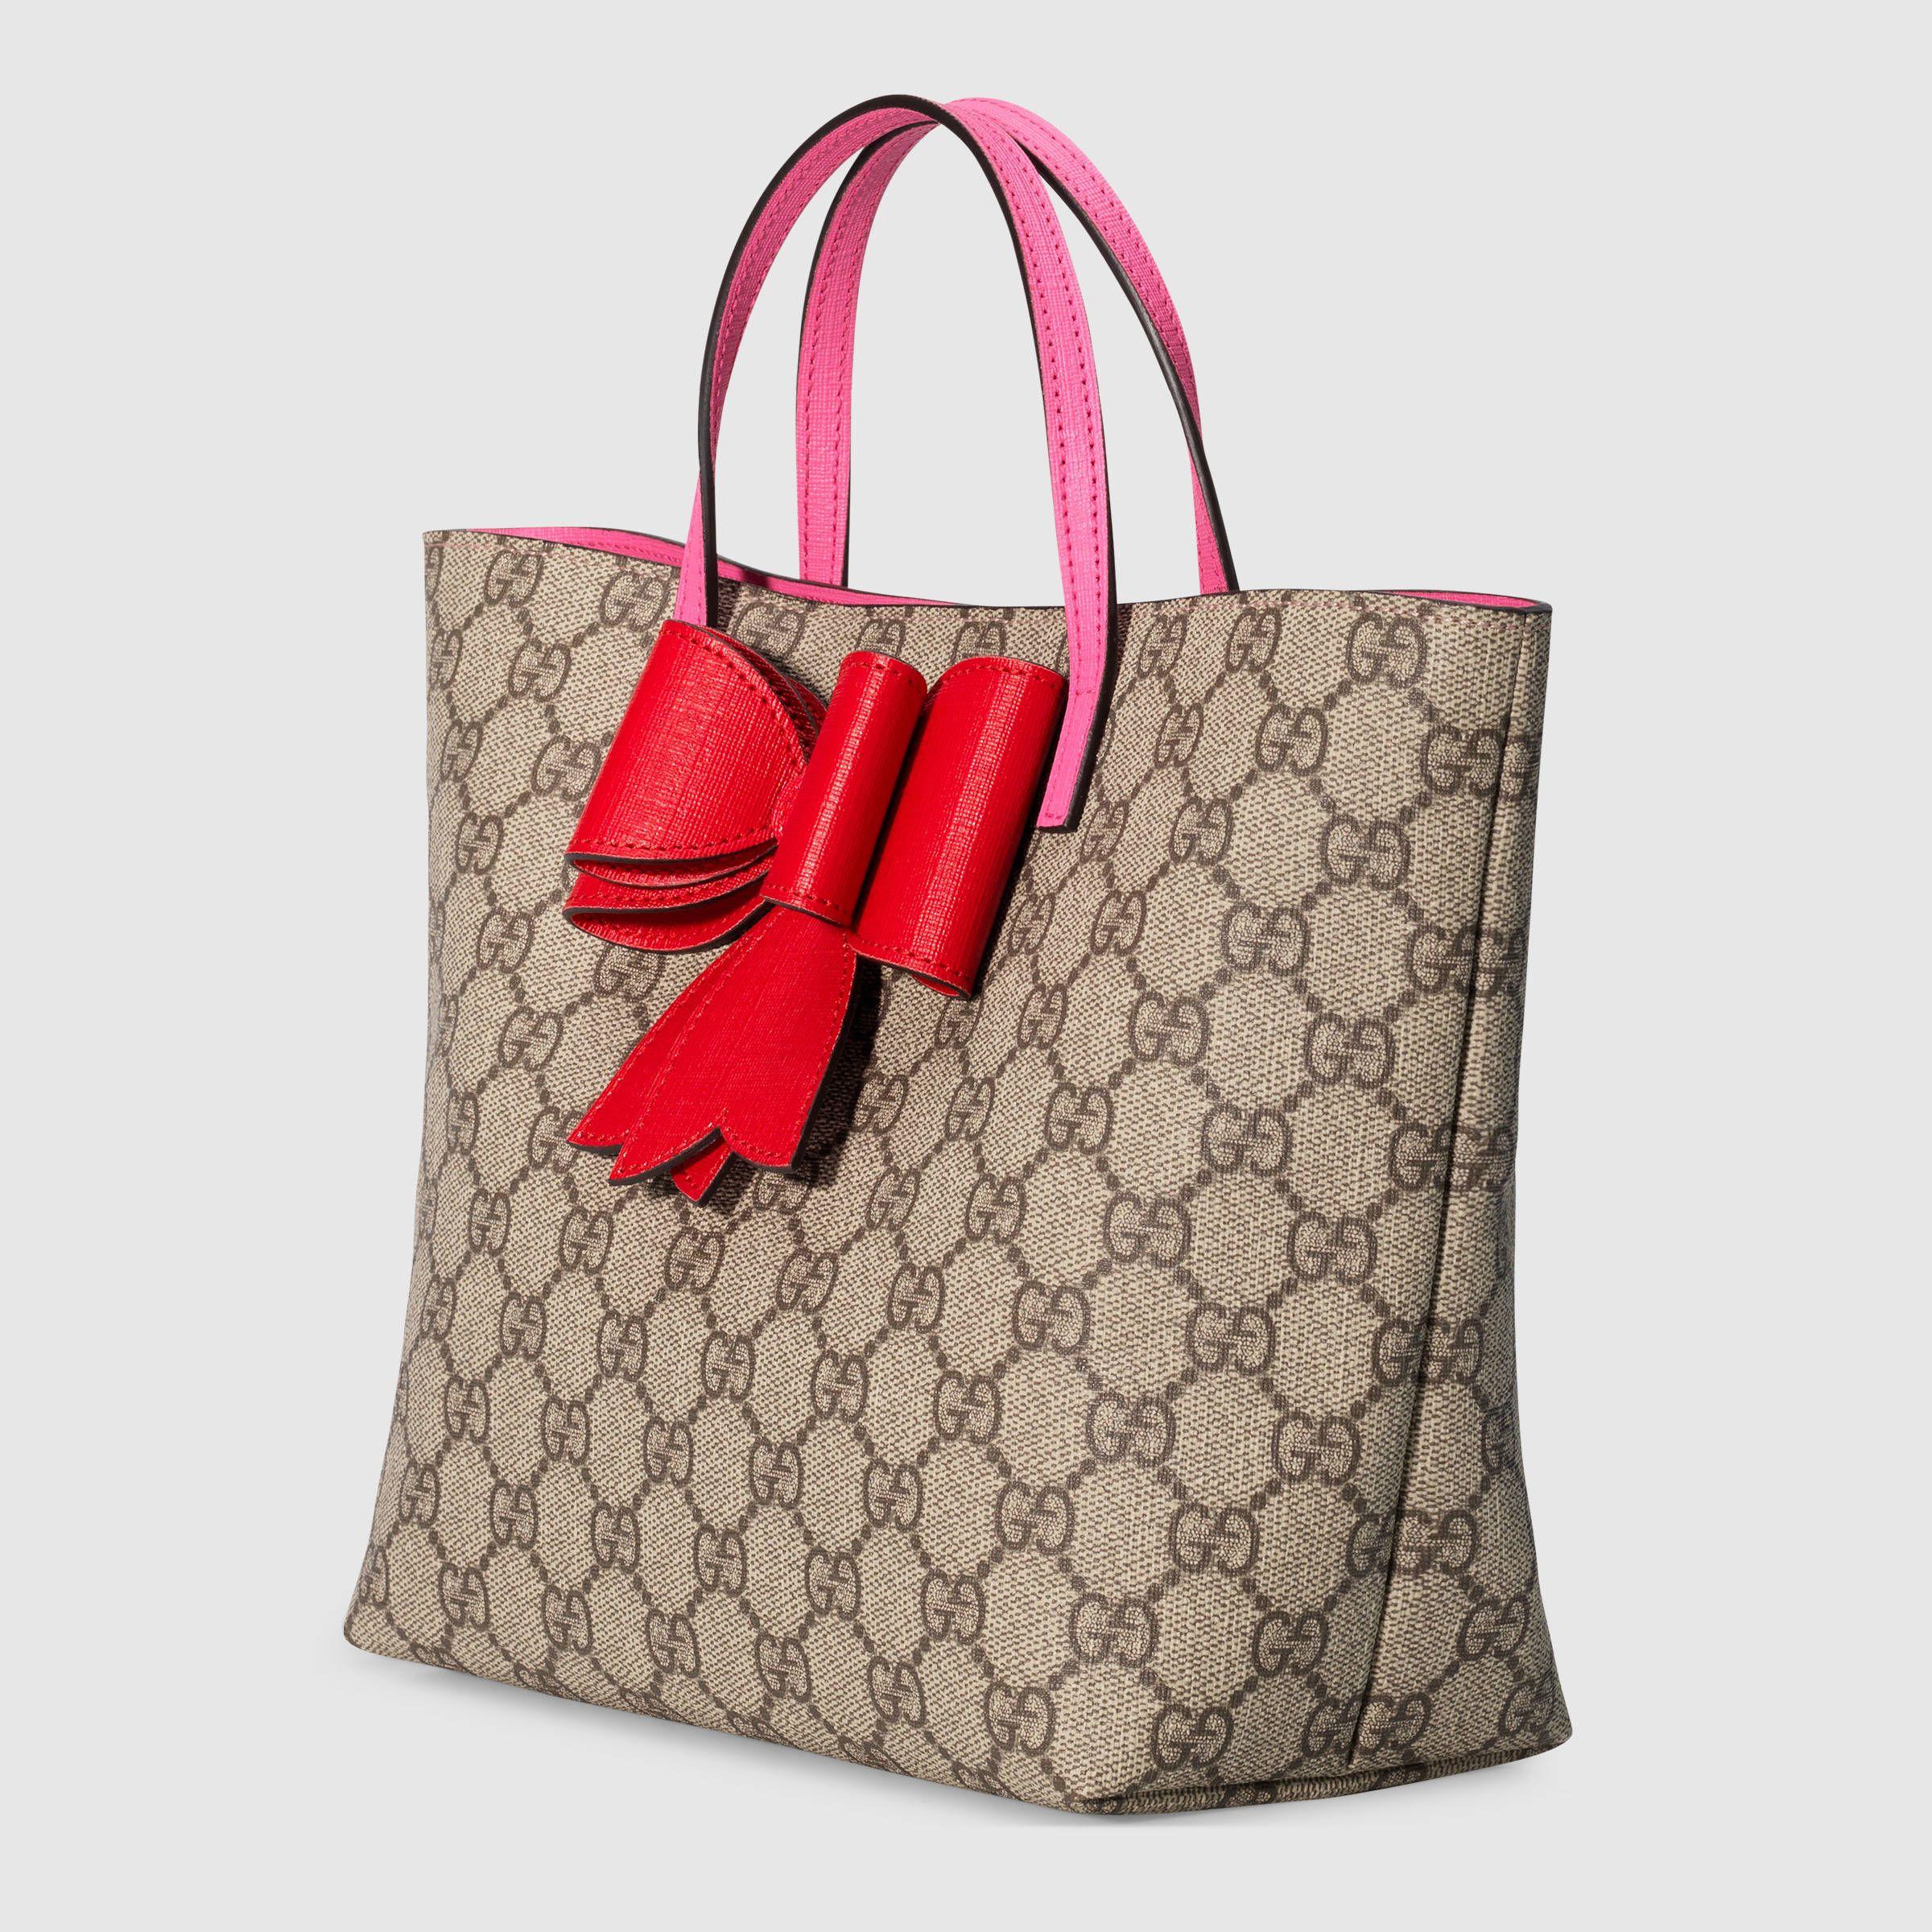 b7d3d5dd27b Children s GG Supreme bow tote - Gucci Children s Gifts 457232K6RTN8279